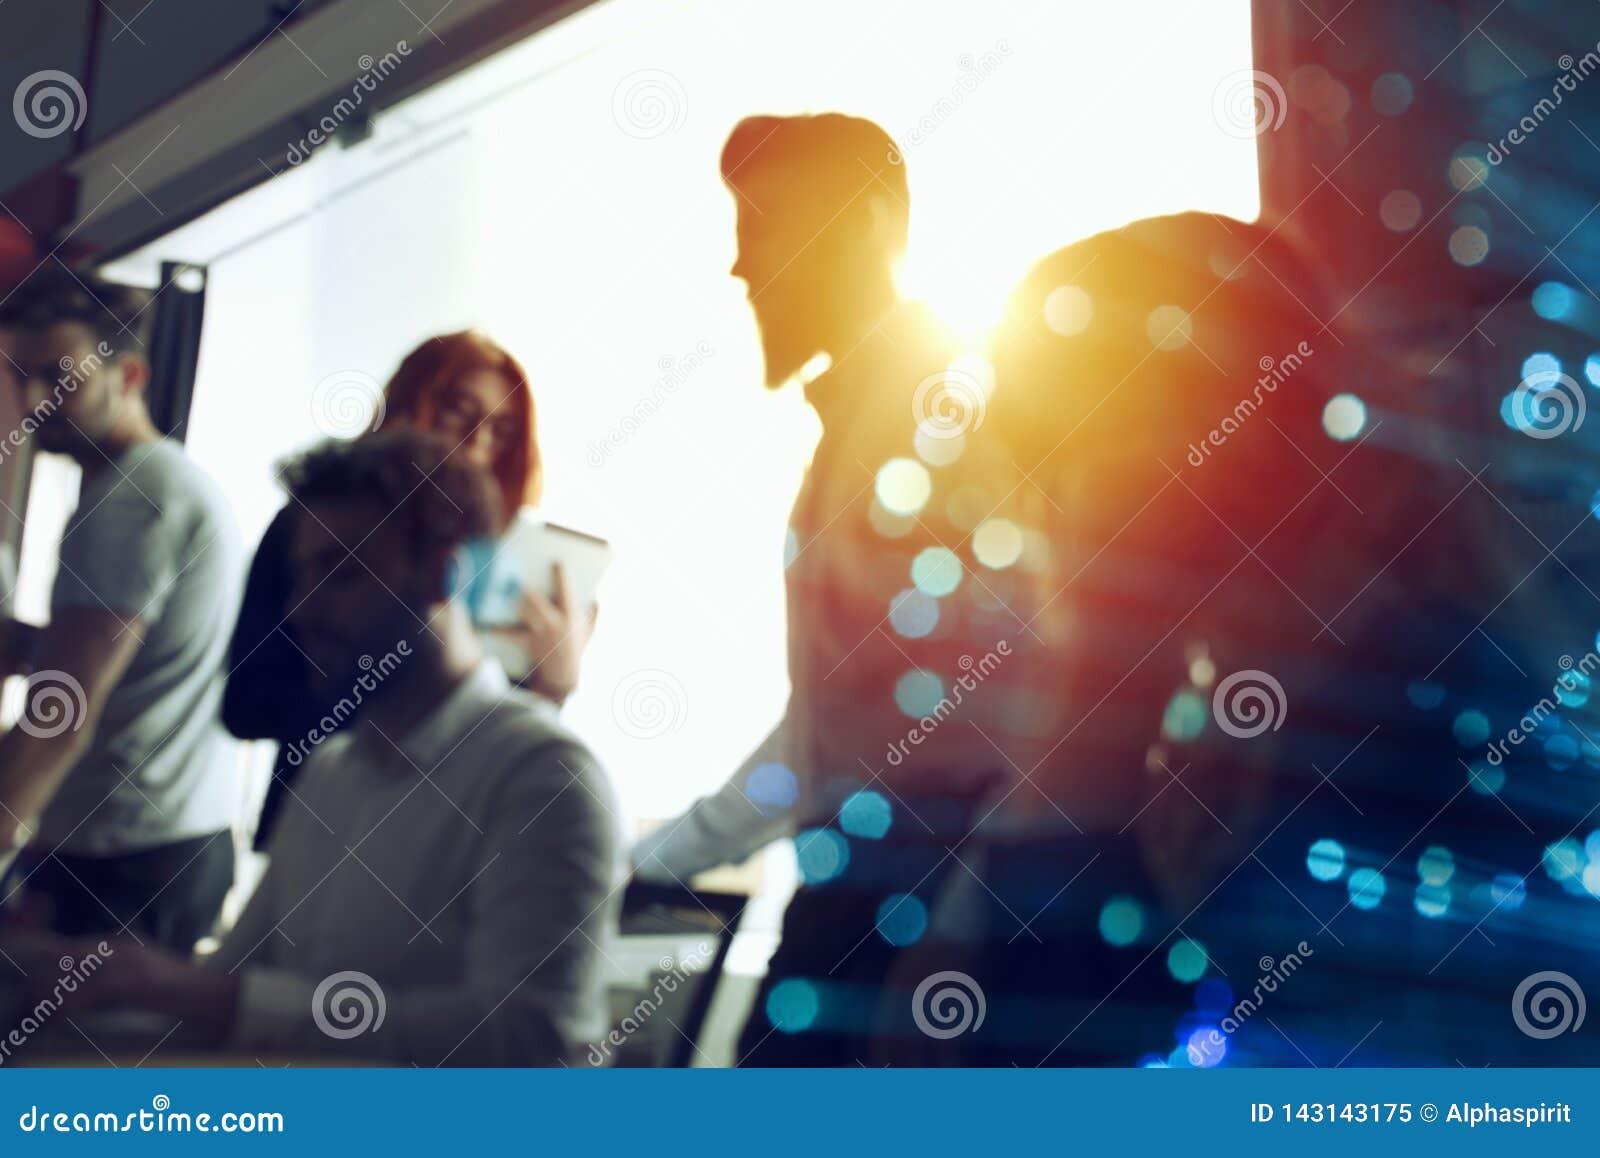 De bedrijfsmensen werken samen in bureau samen Dubbele blootstellingsgevolgen